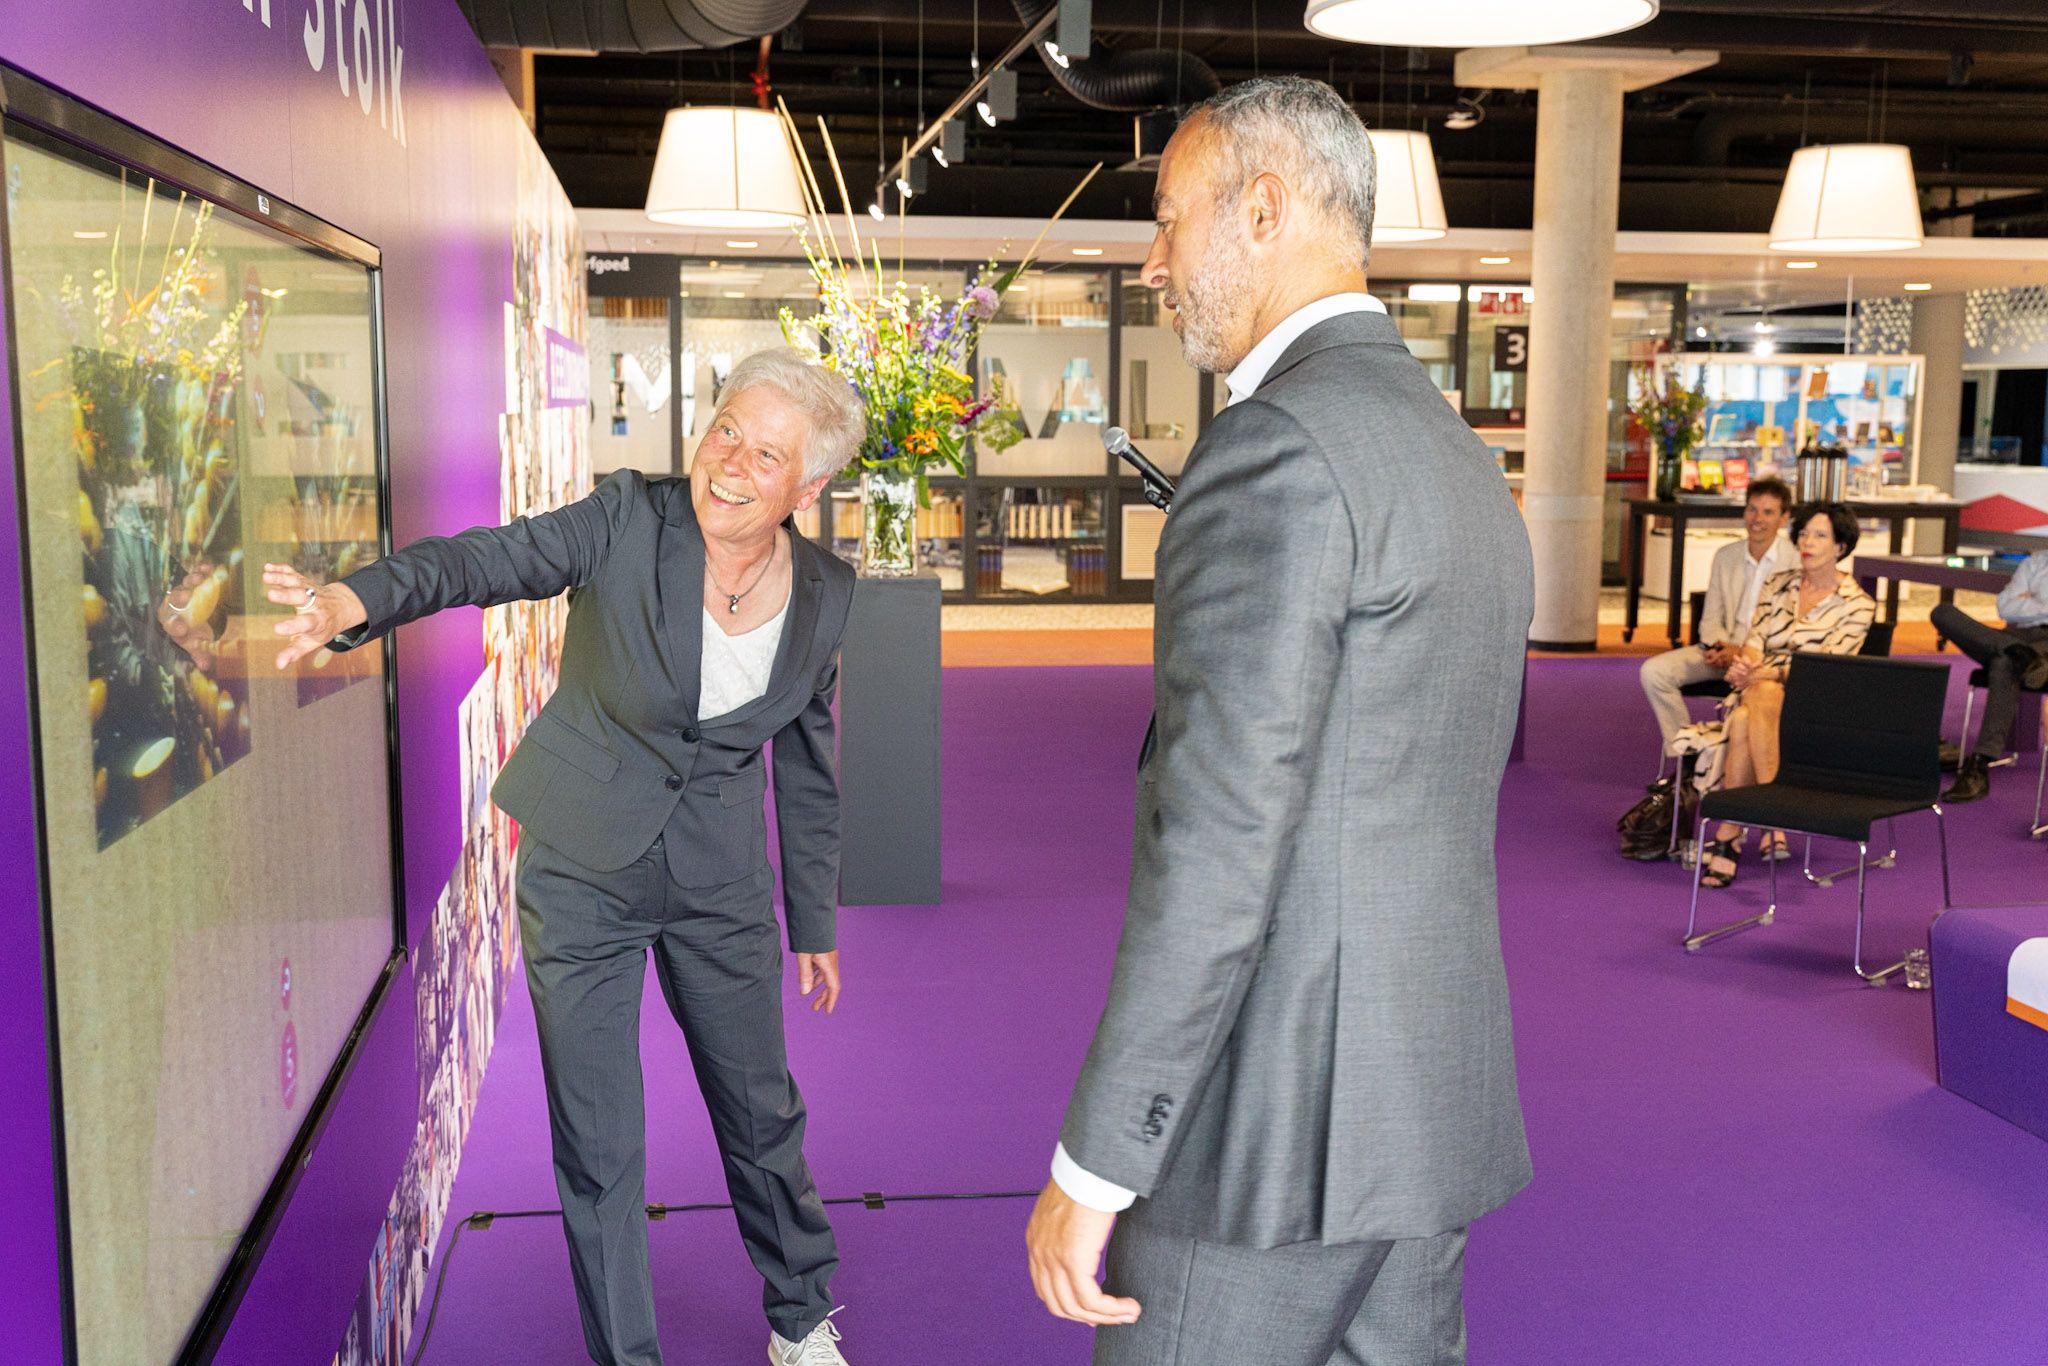 Lina van der Wolde, directeur Atlas van Stolk, met Wethouder Cultuur, Onderwijs en Toerisme Said Kasmi